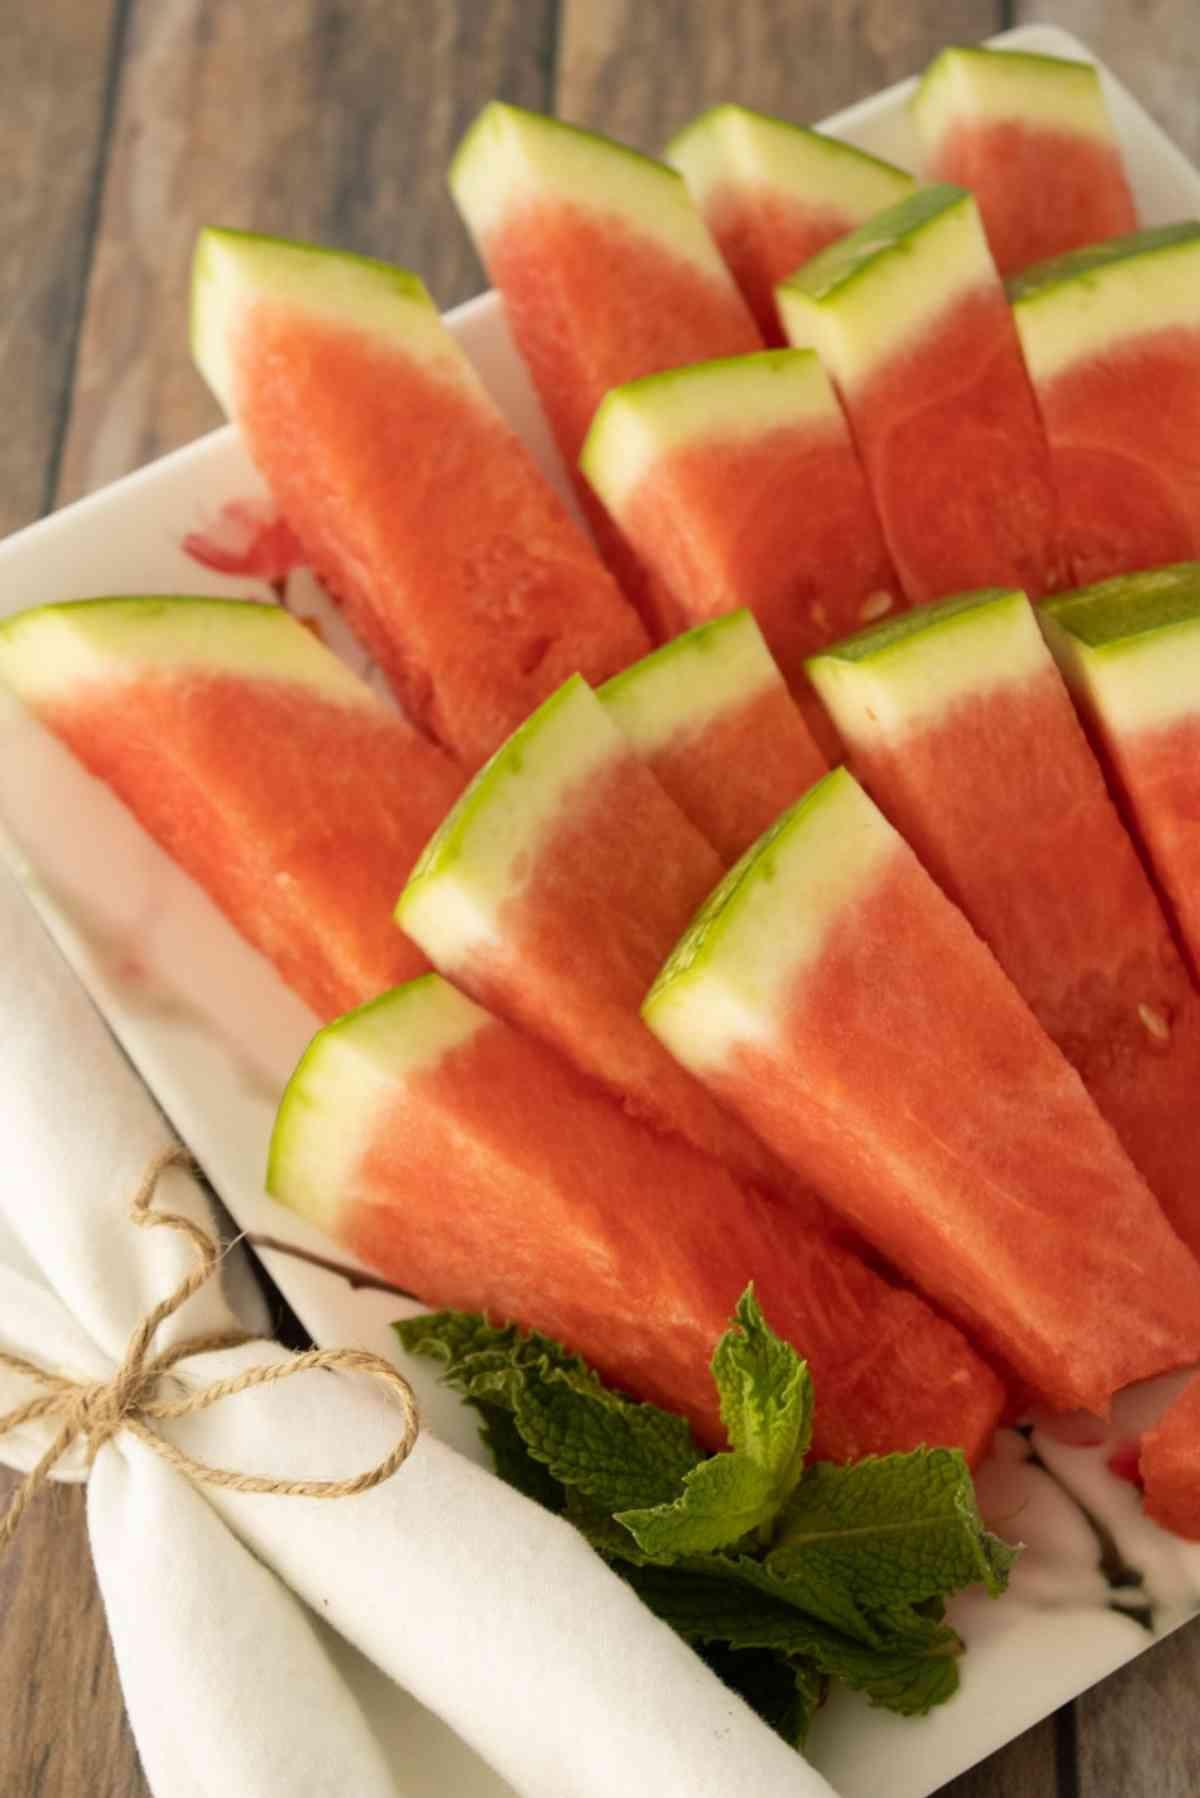 Melon sticks arranged on a platter garnished with fresh mint leaves.